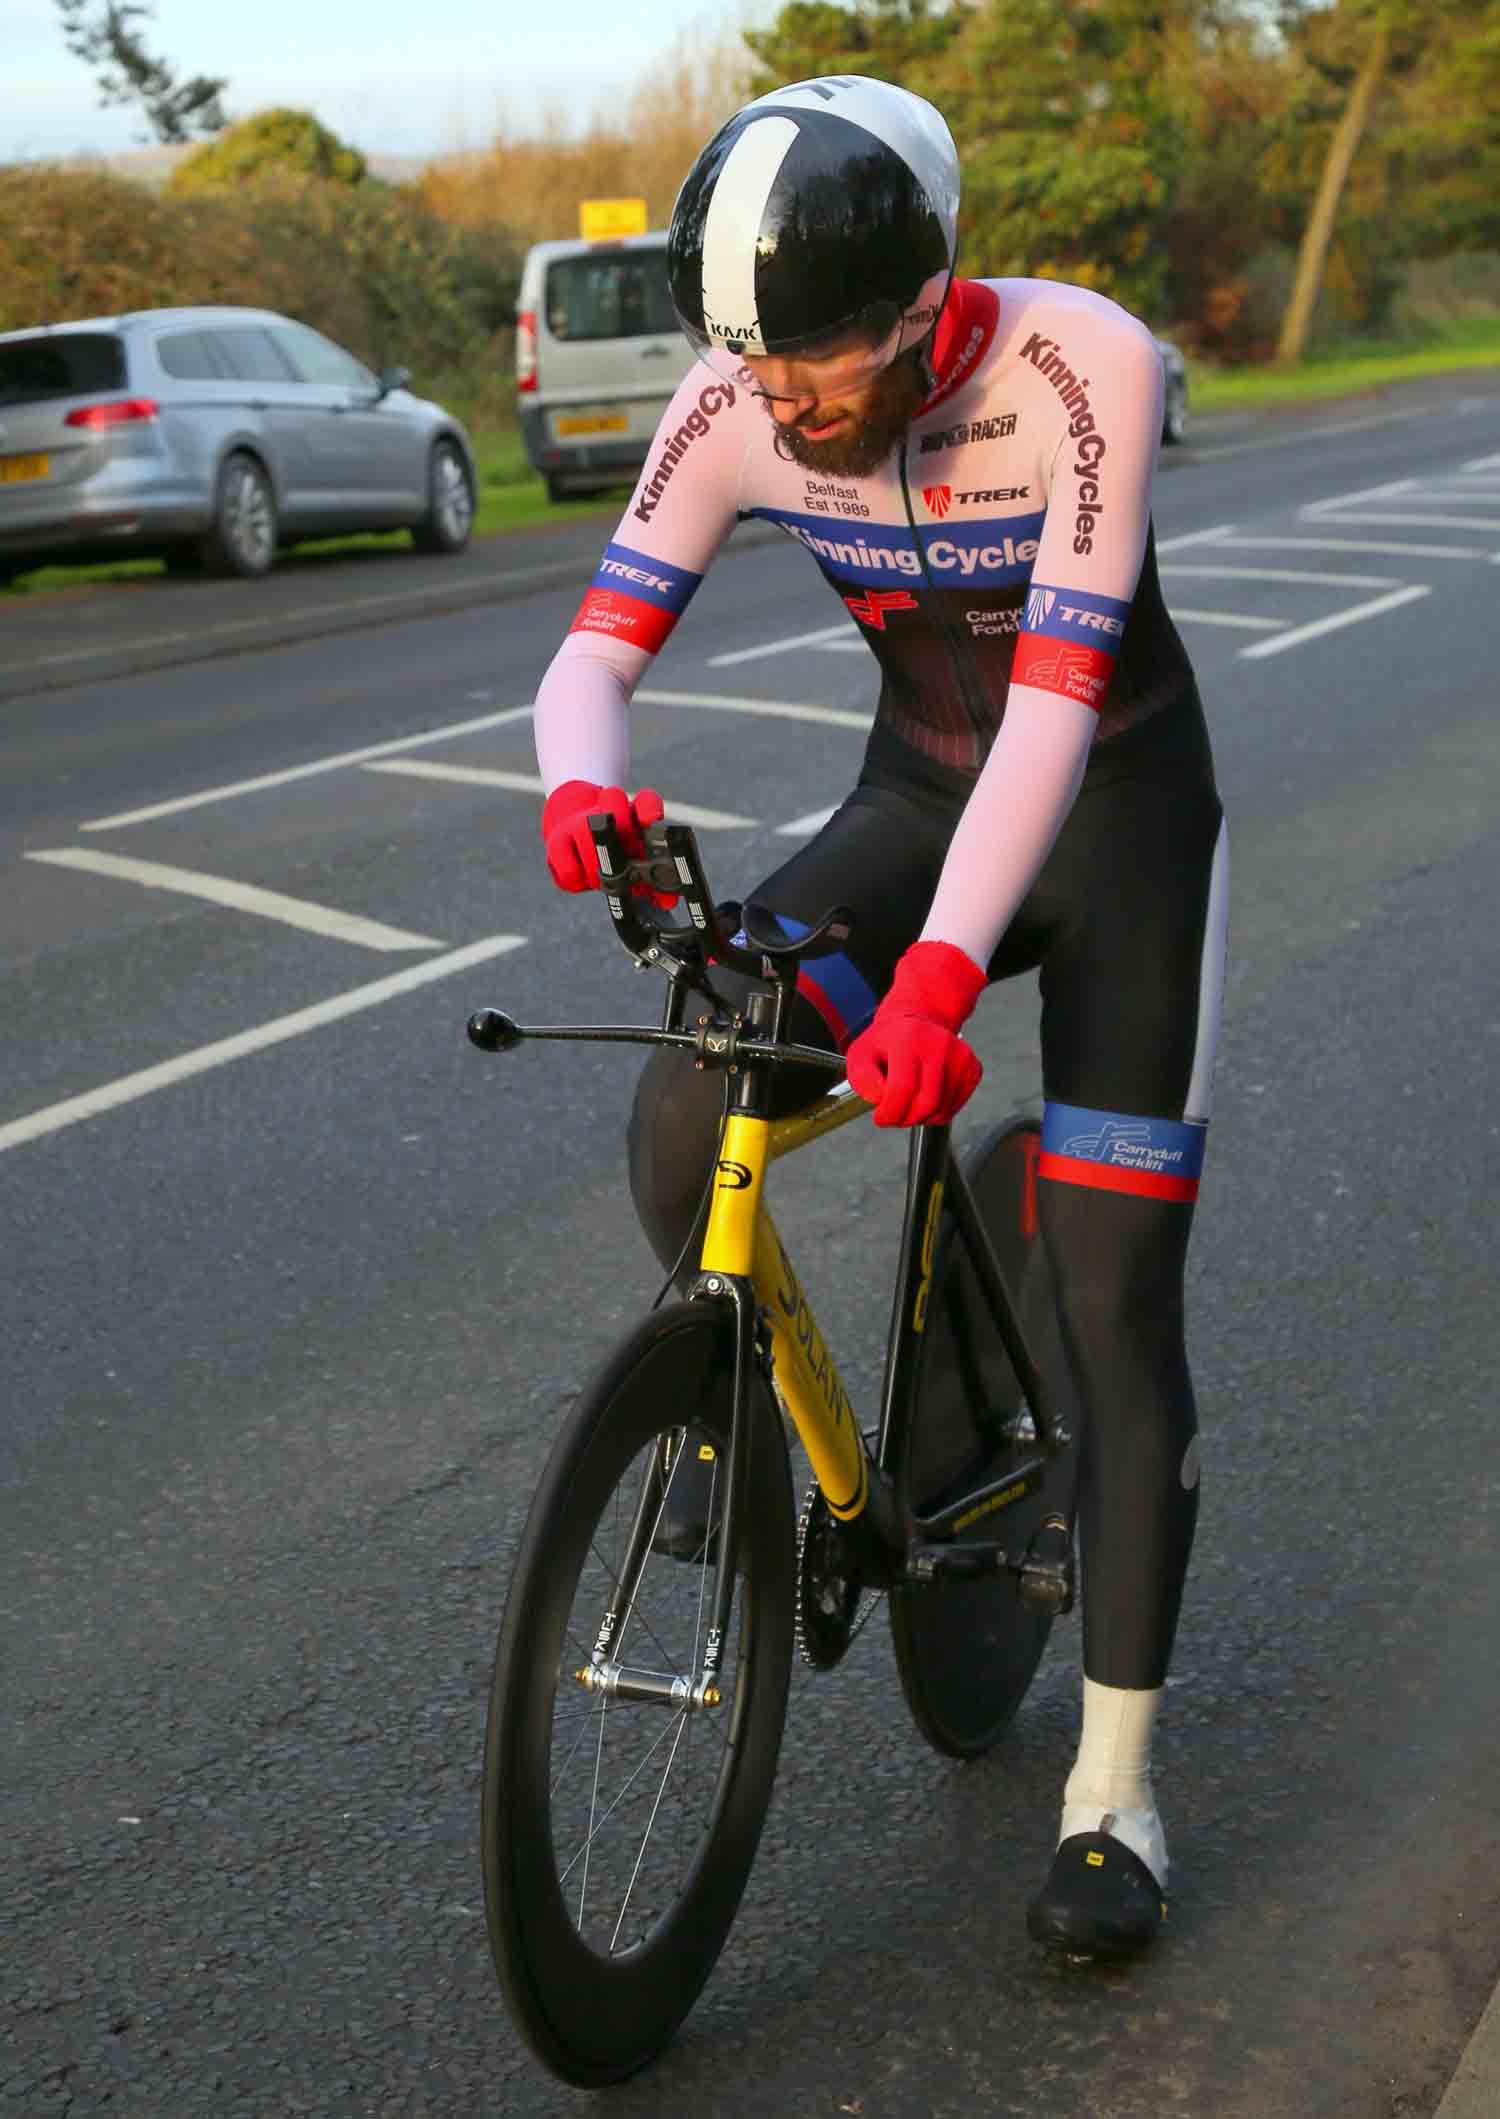 Five times winner Ian Inglis (Kinning) looks focused at the start.